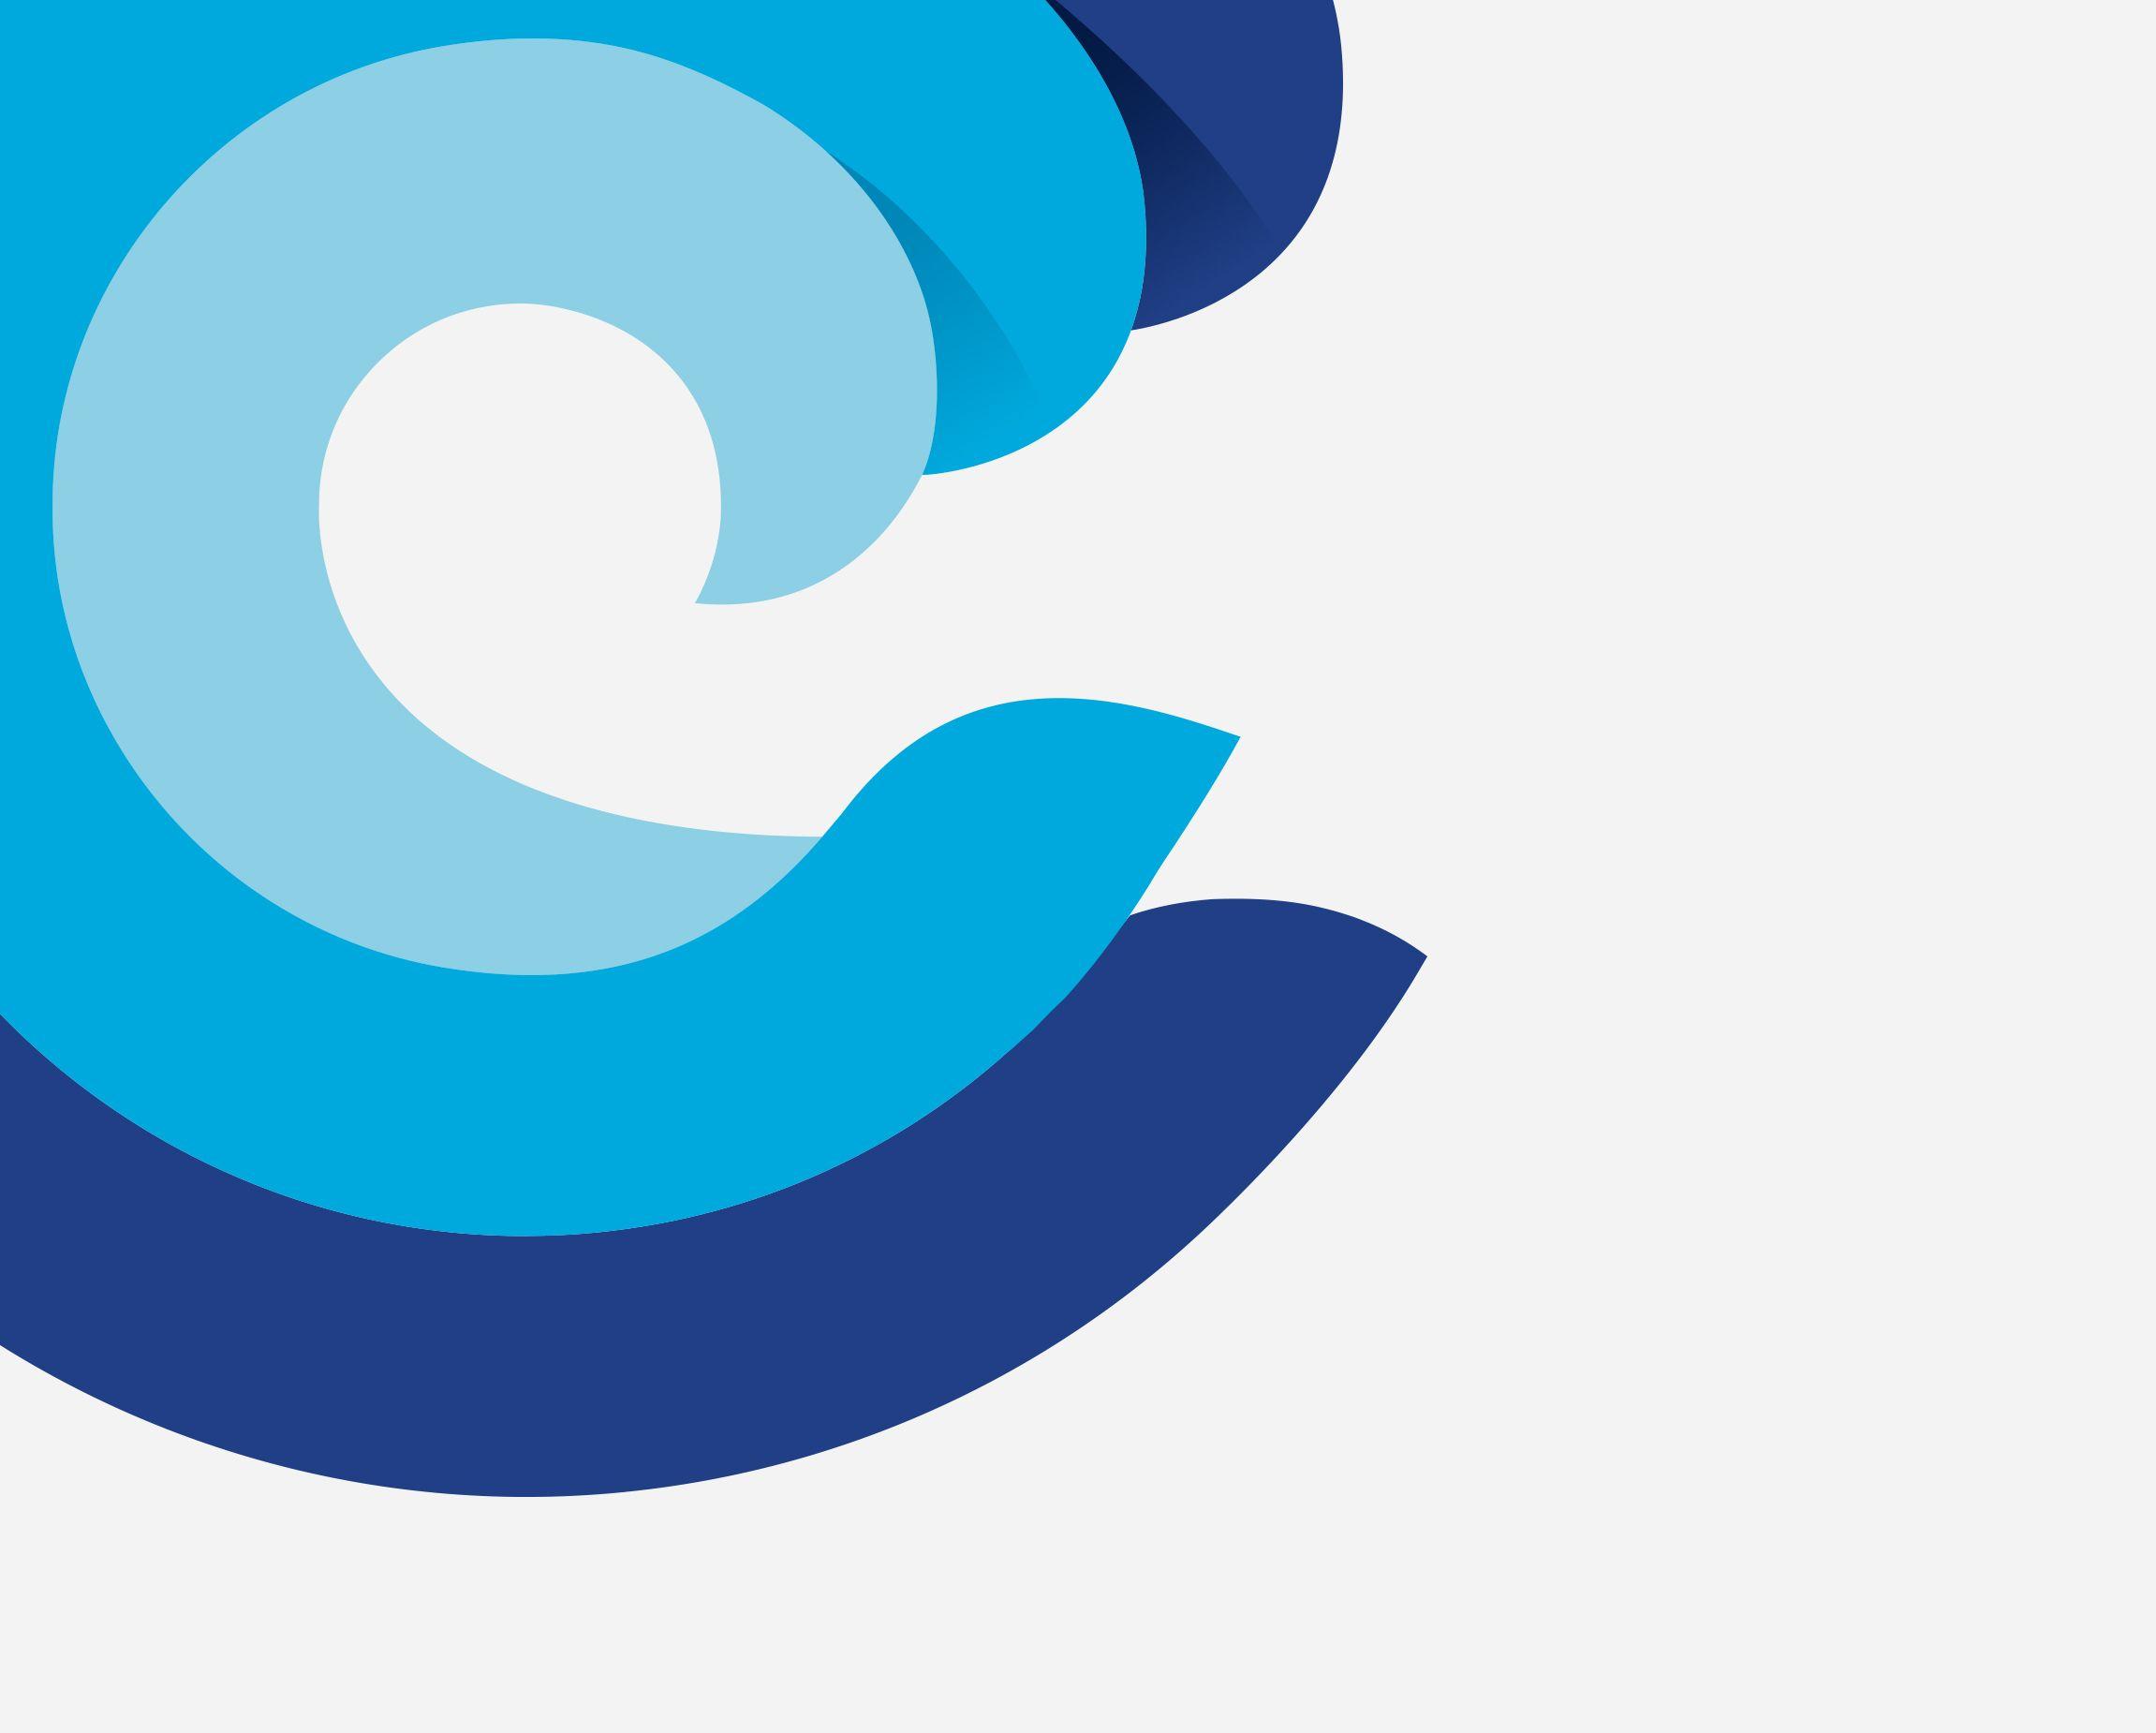 Large C Wave Logo for Catalina Island